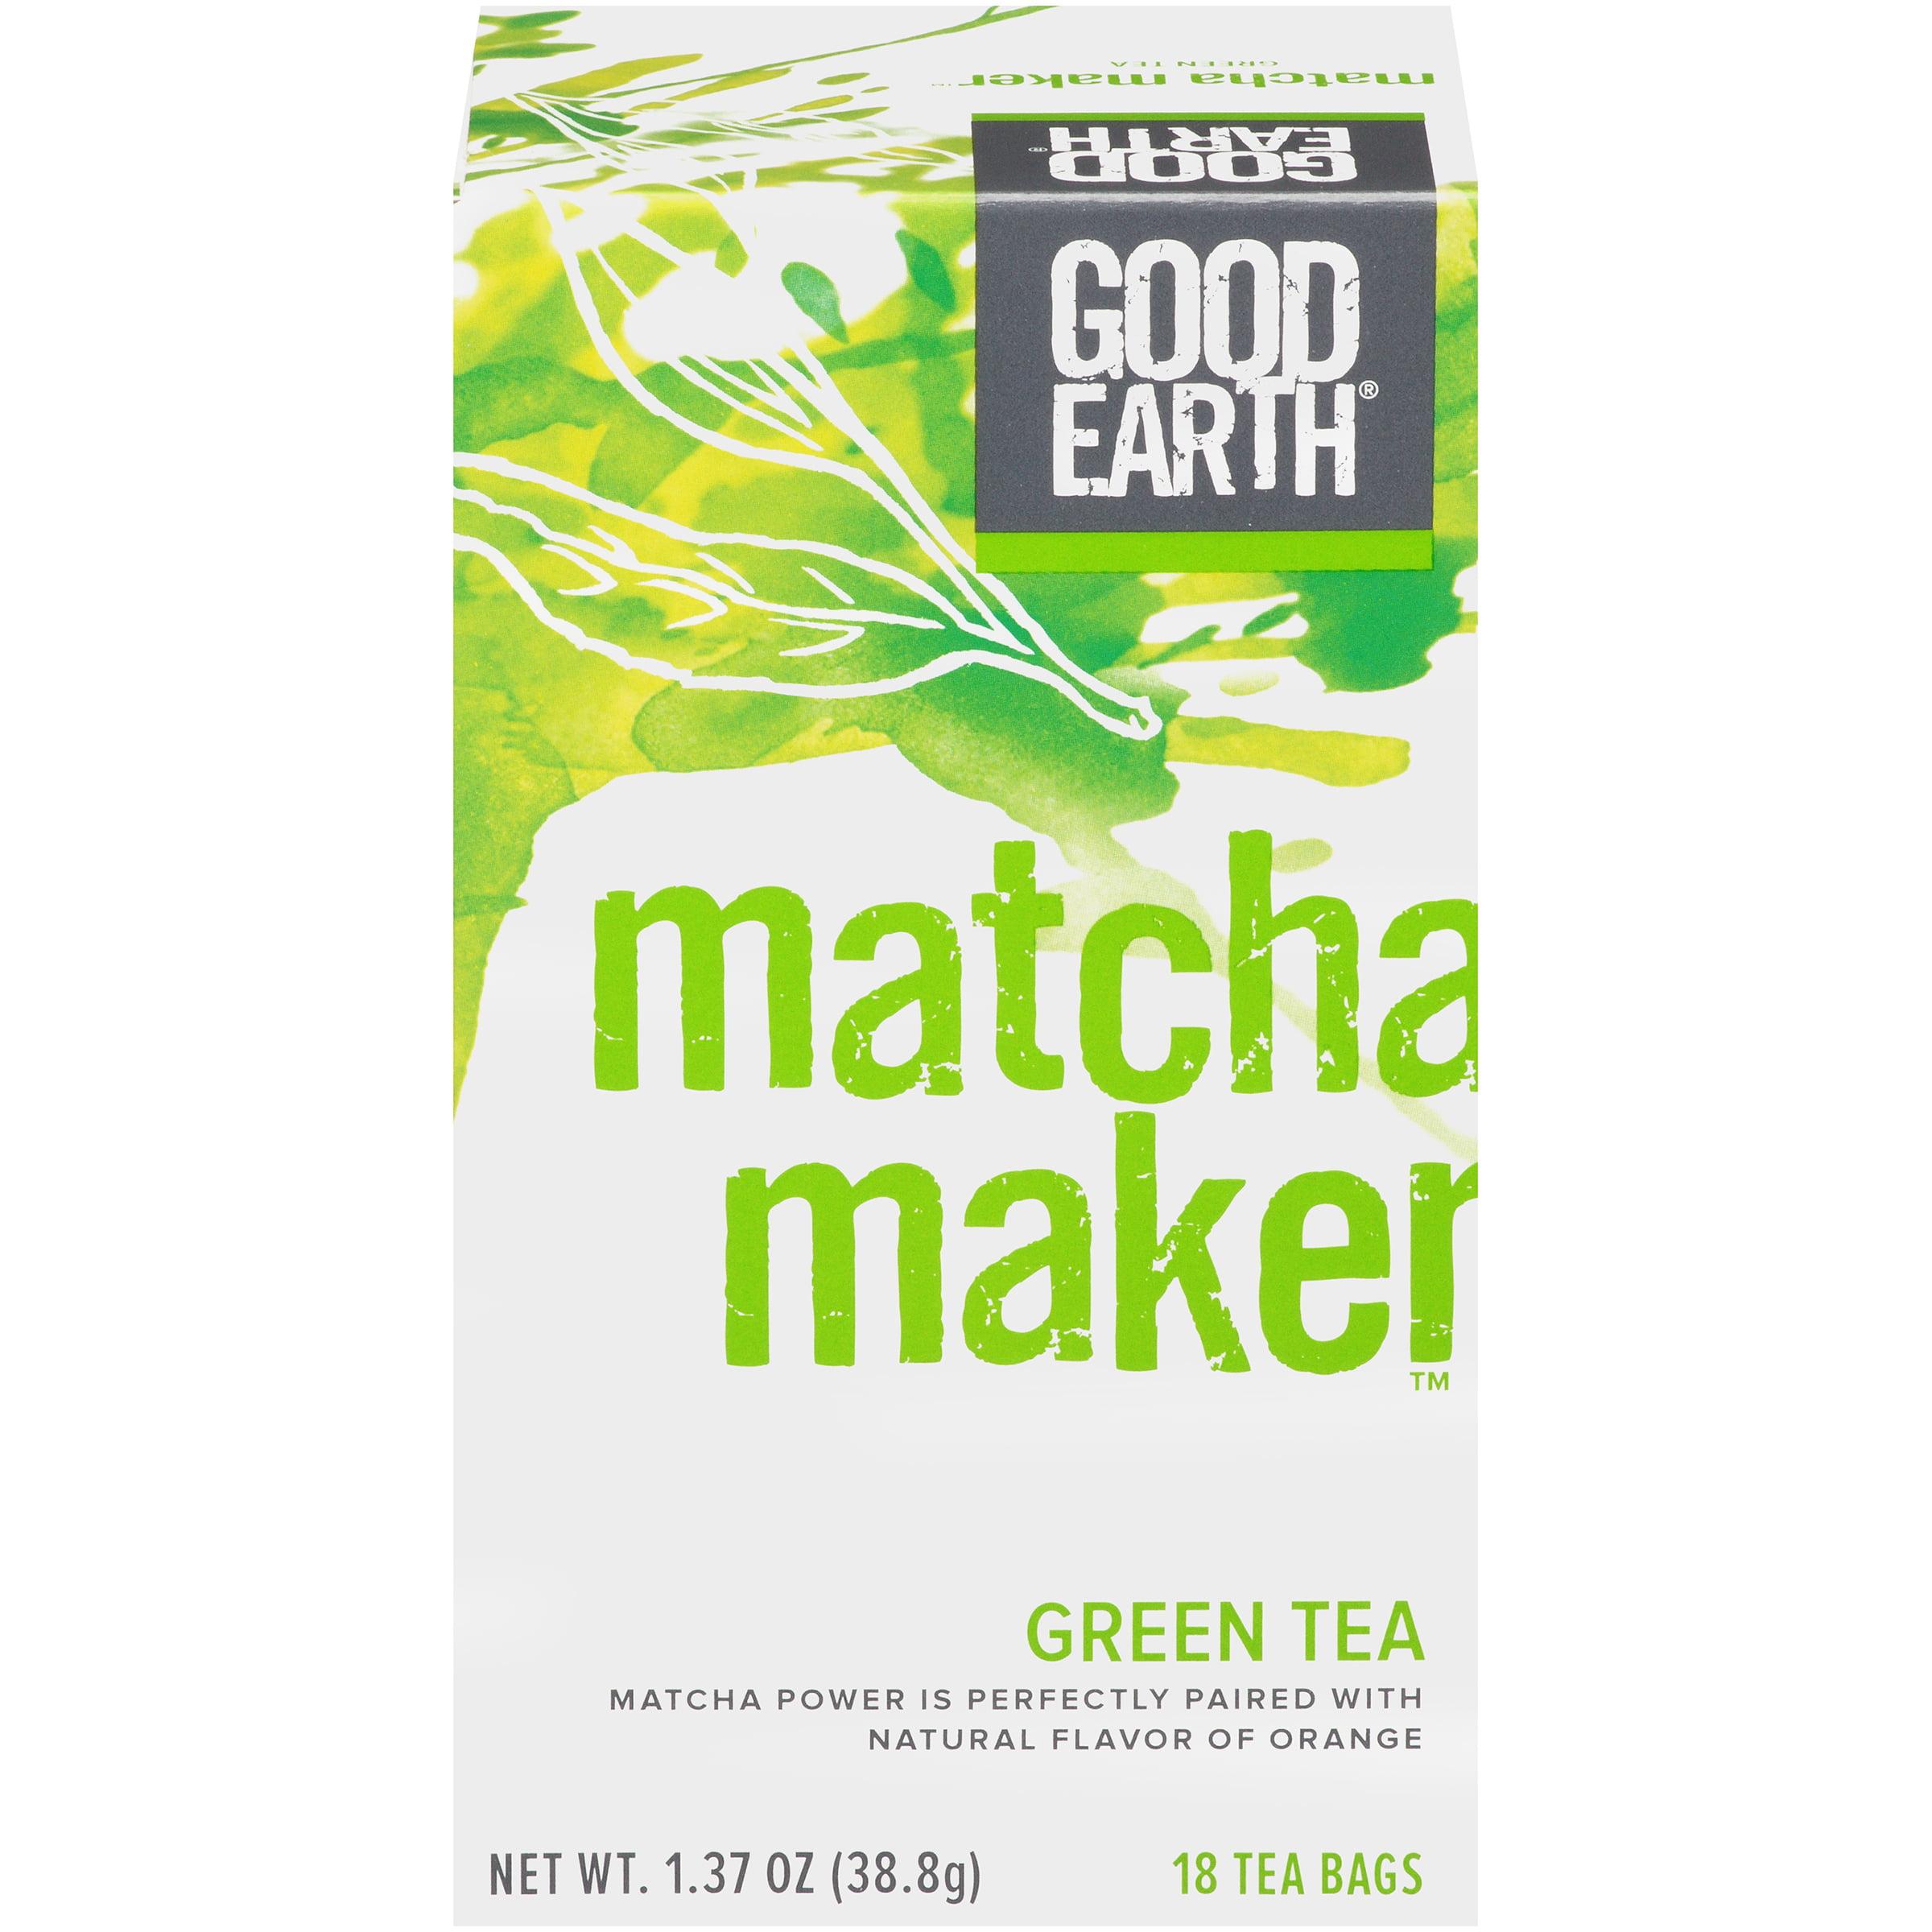 (3 Pack) Good Earth Matcha Maker, Green Tea, Tea Bags, 18 Ct